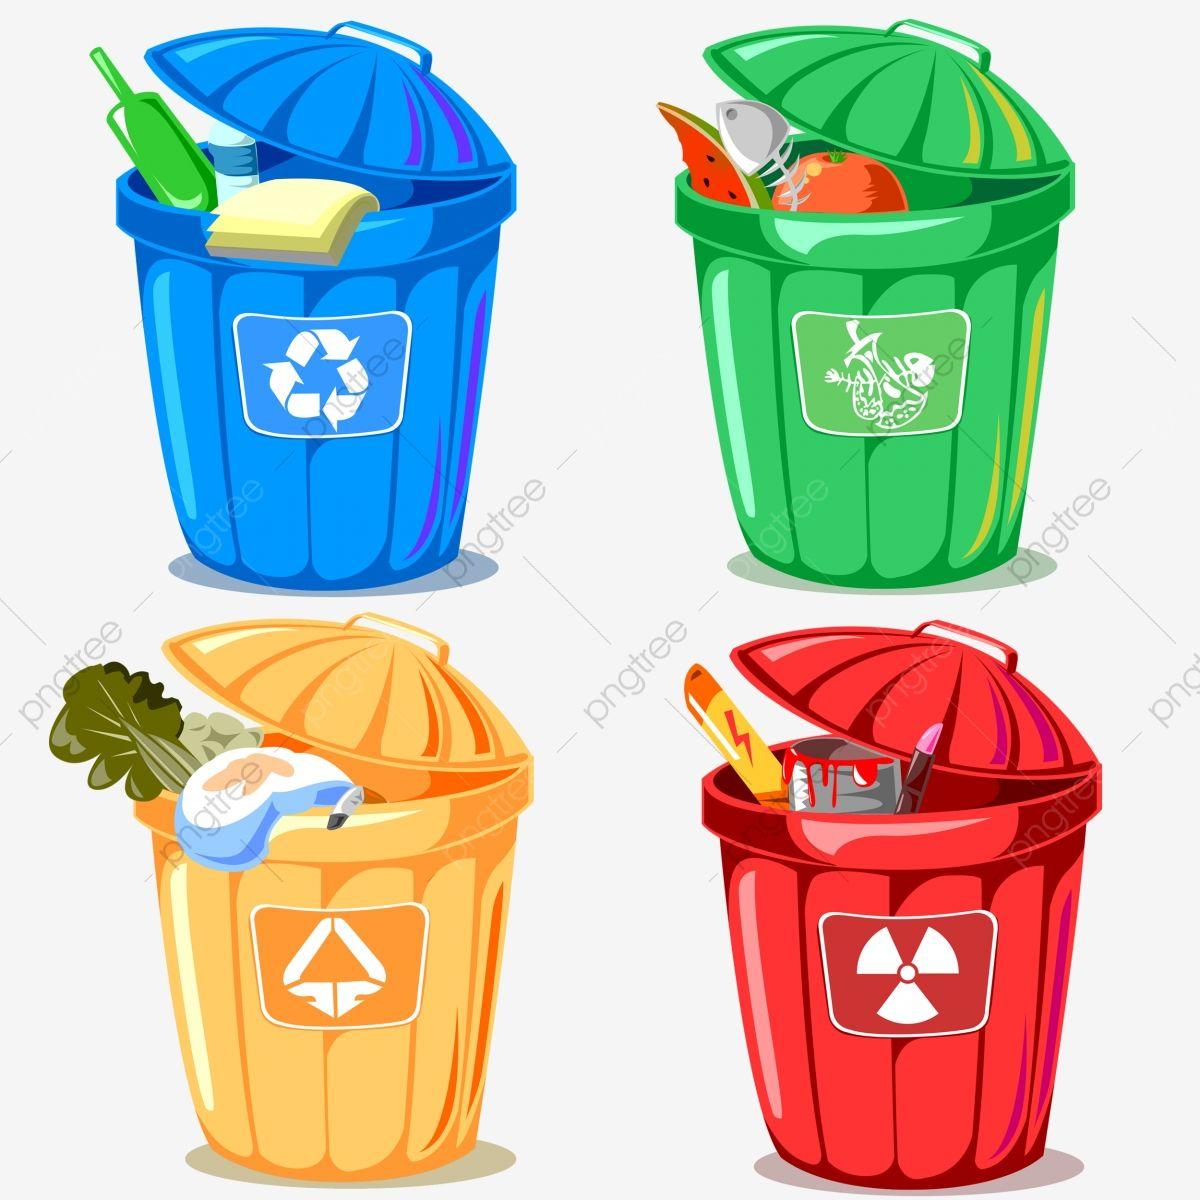 Cartoon Environmental Protection Rubbish Trash Can Trash Can Environmental Trash Can Environmental Theme Png Transparent Clipart Image And Psd File For Free Trash Can Trash Bins Trash